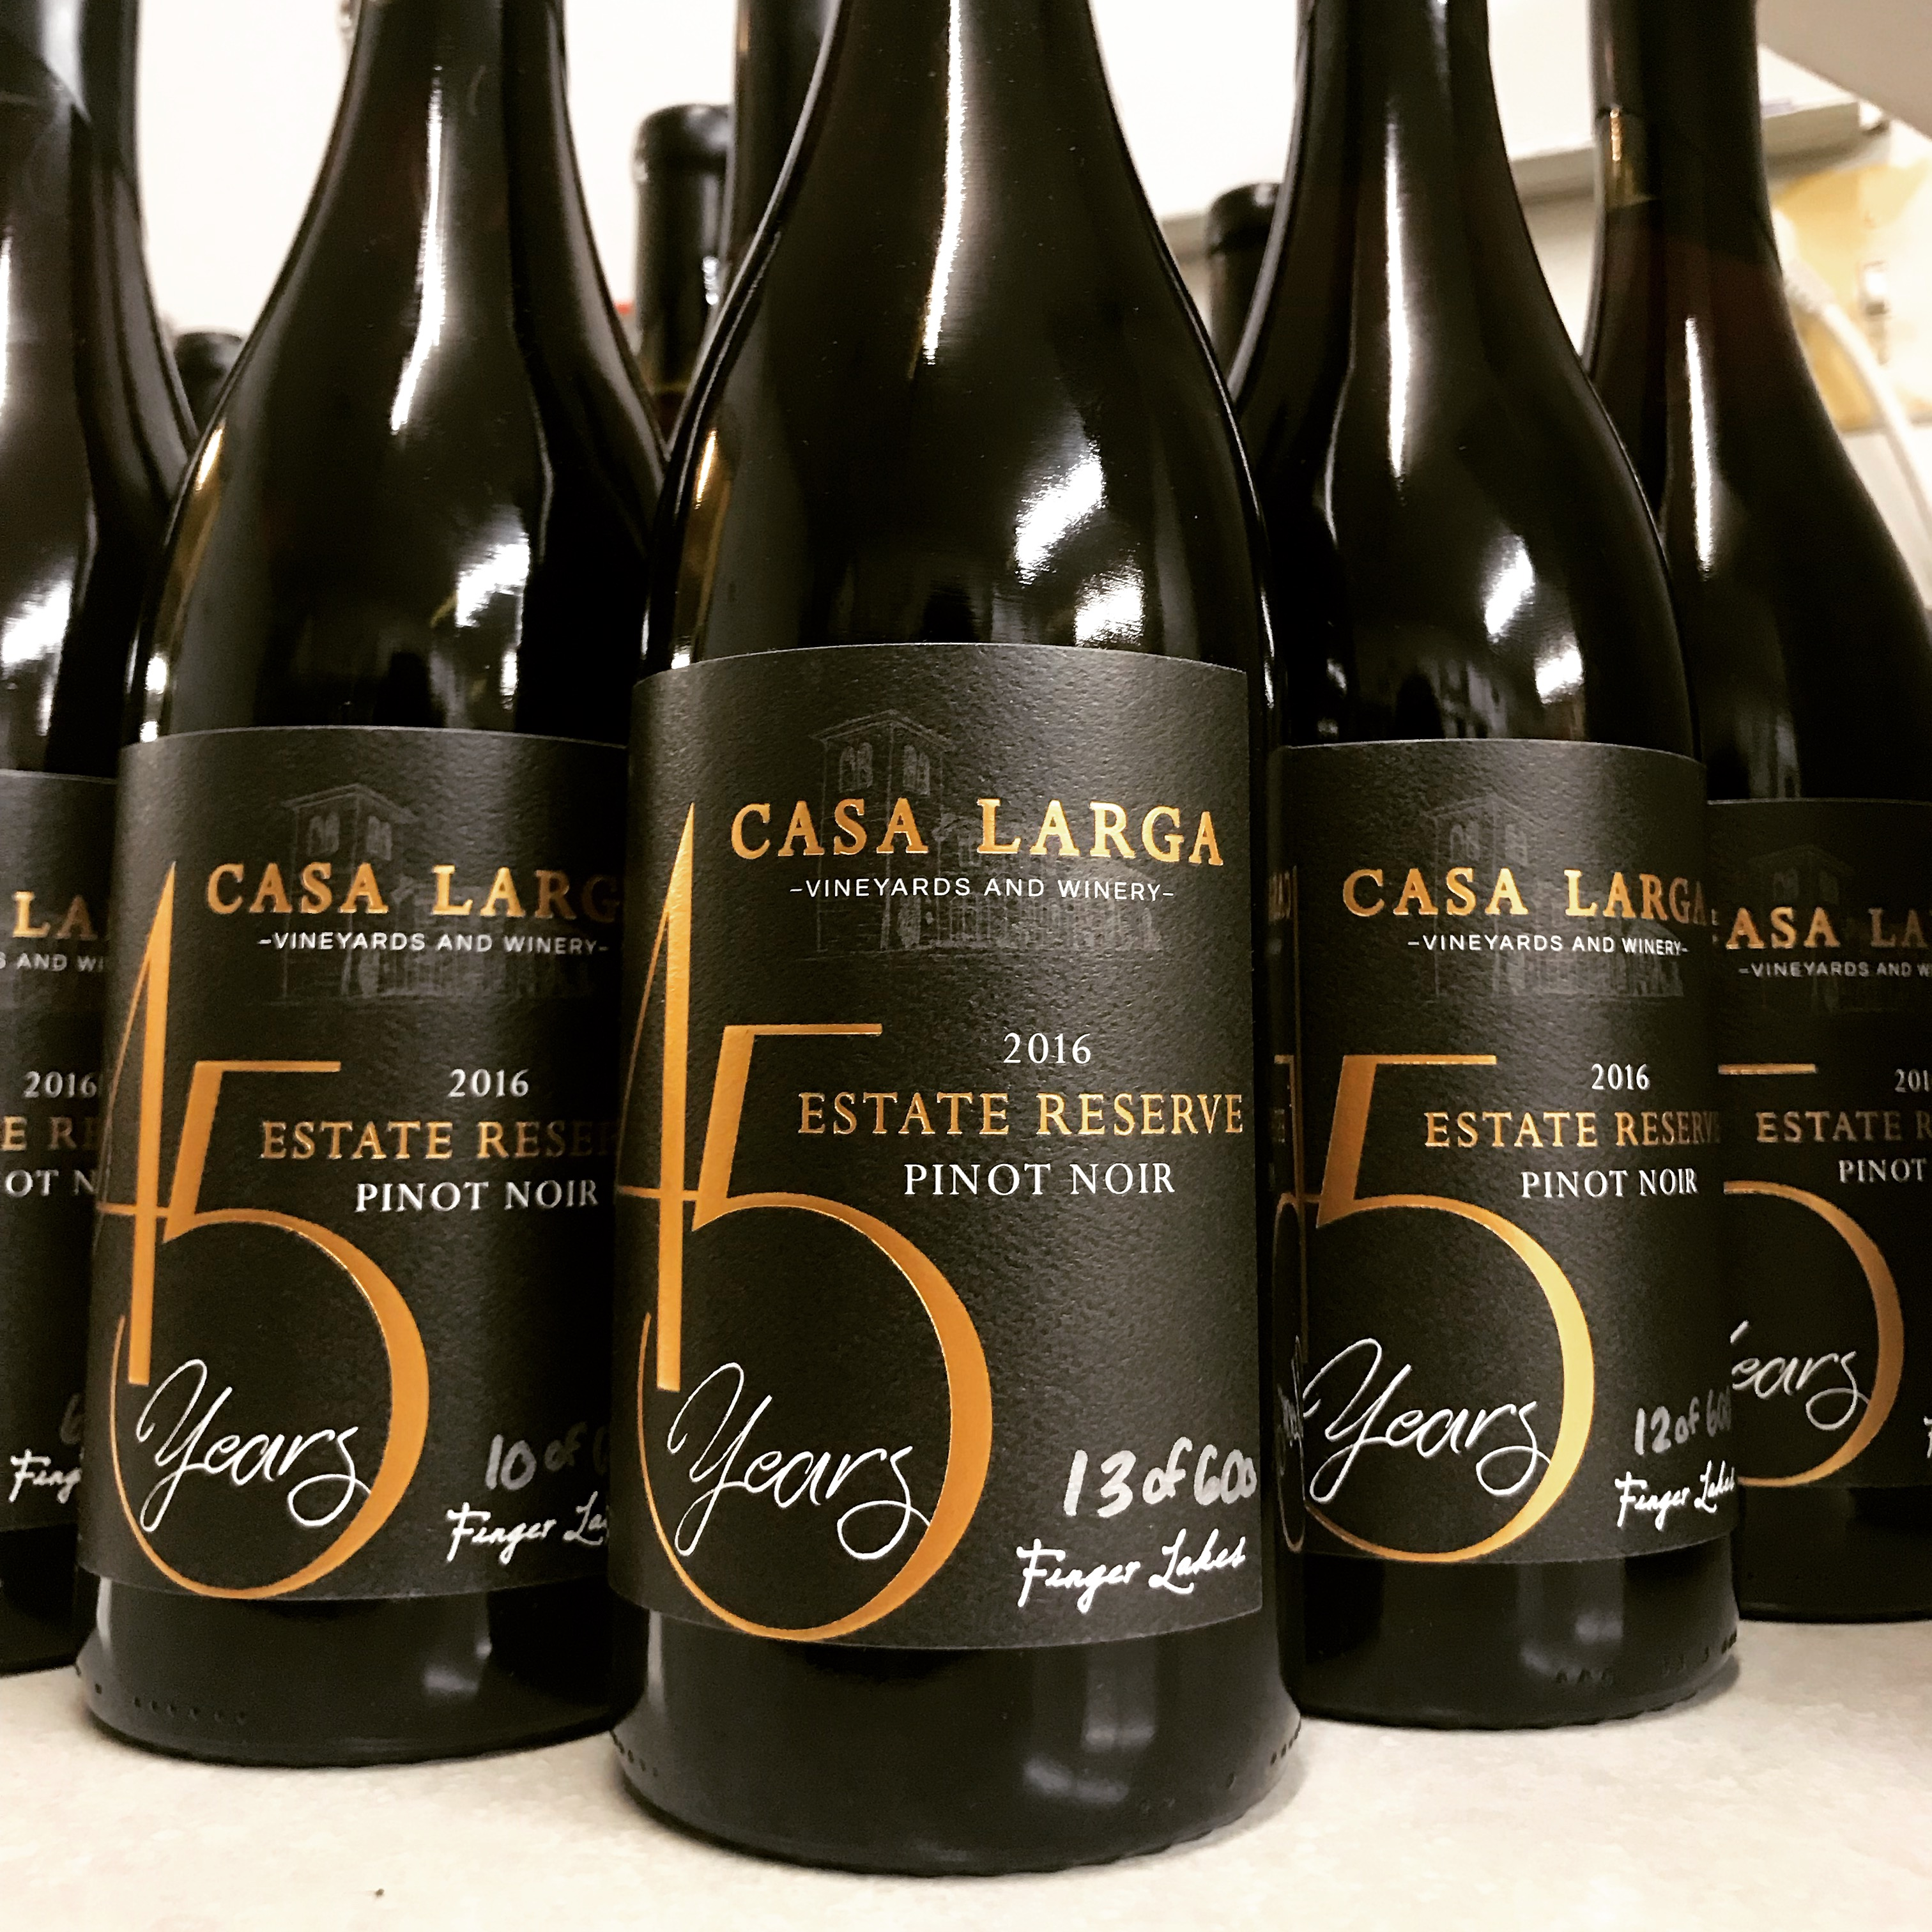 2016 Casa Larga Vineyards Estate Reserve Pinot Noir for Casa Larga Vineyards 45th Anniversary